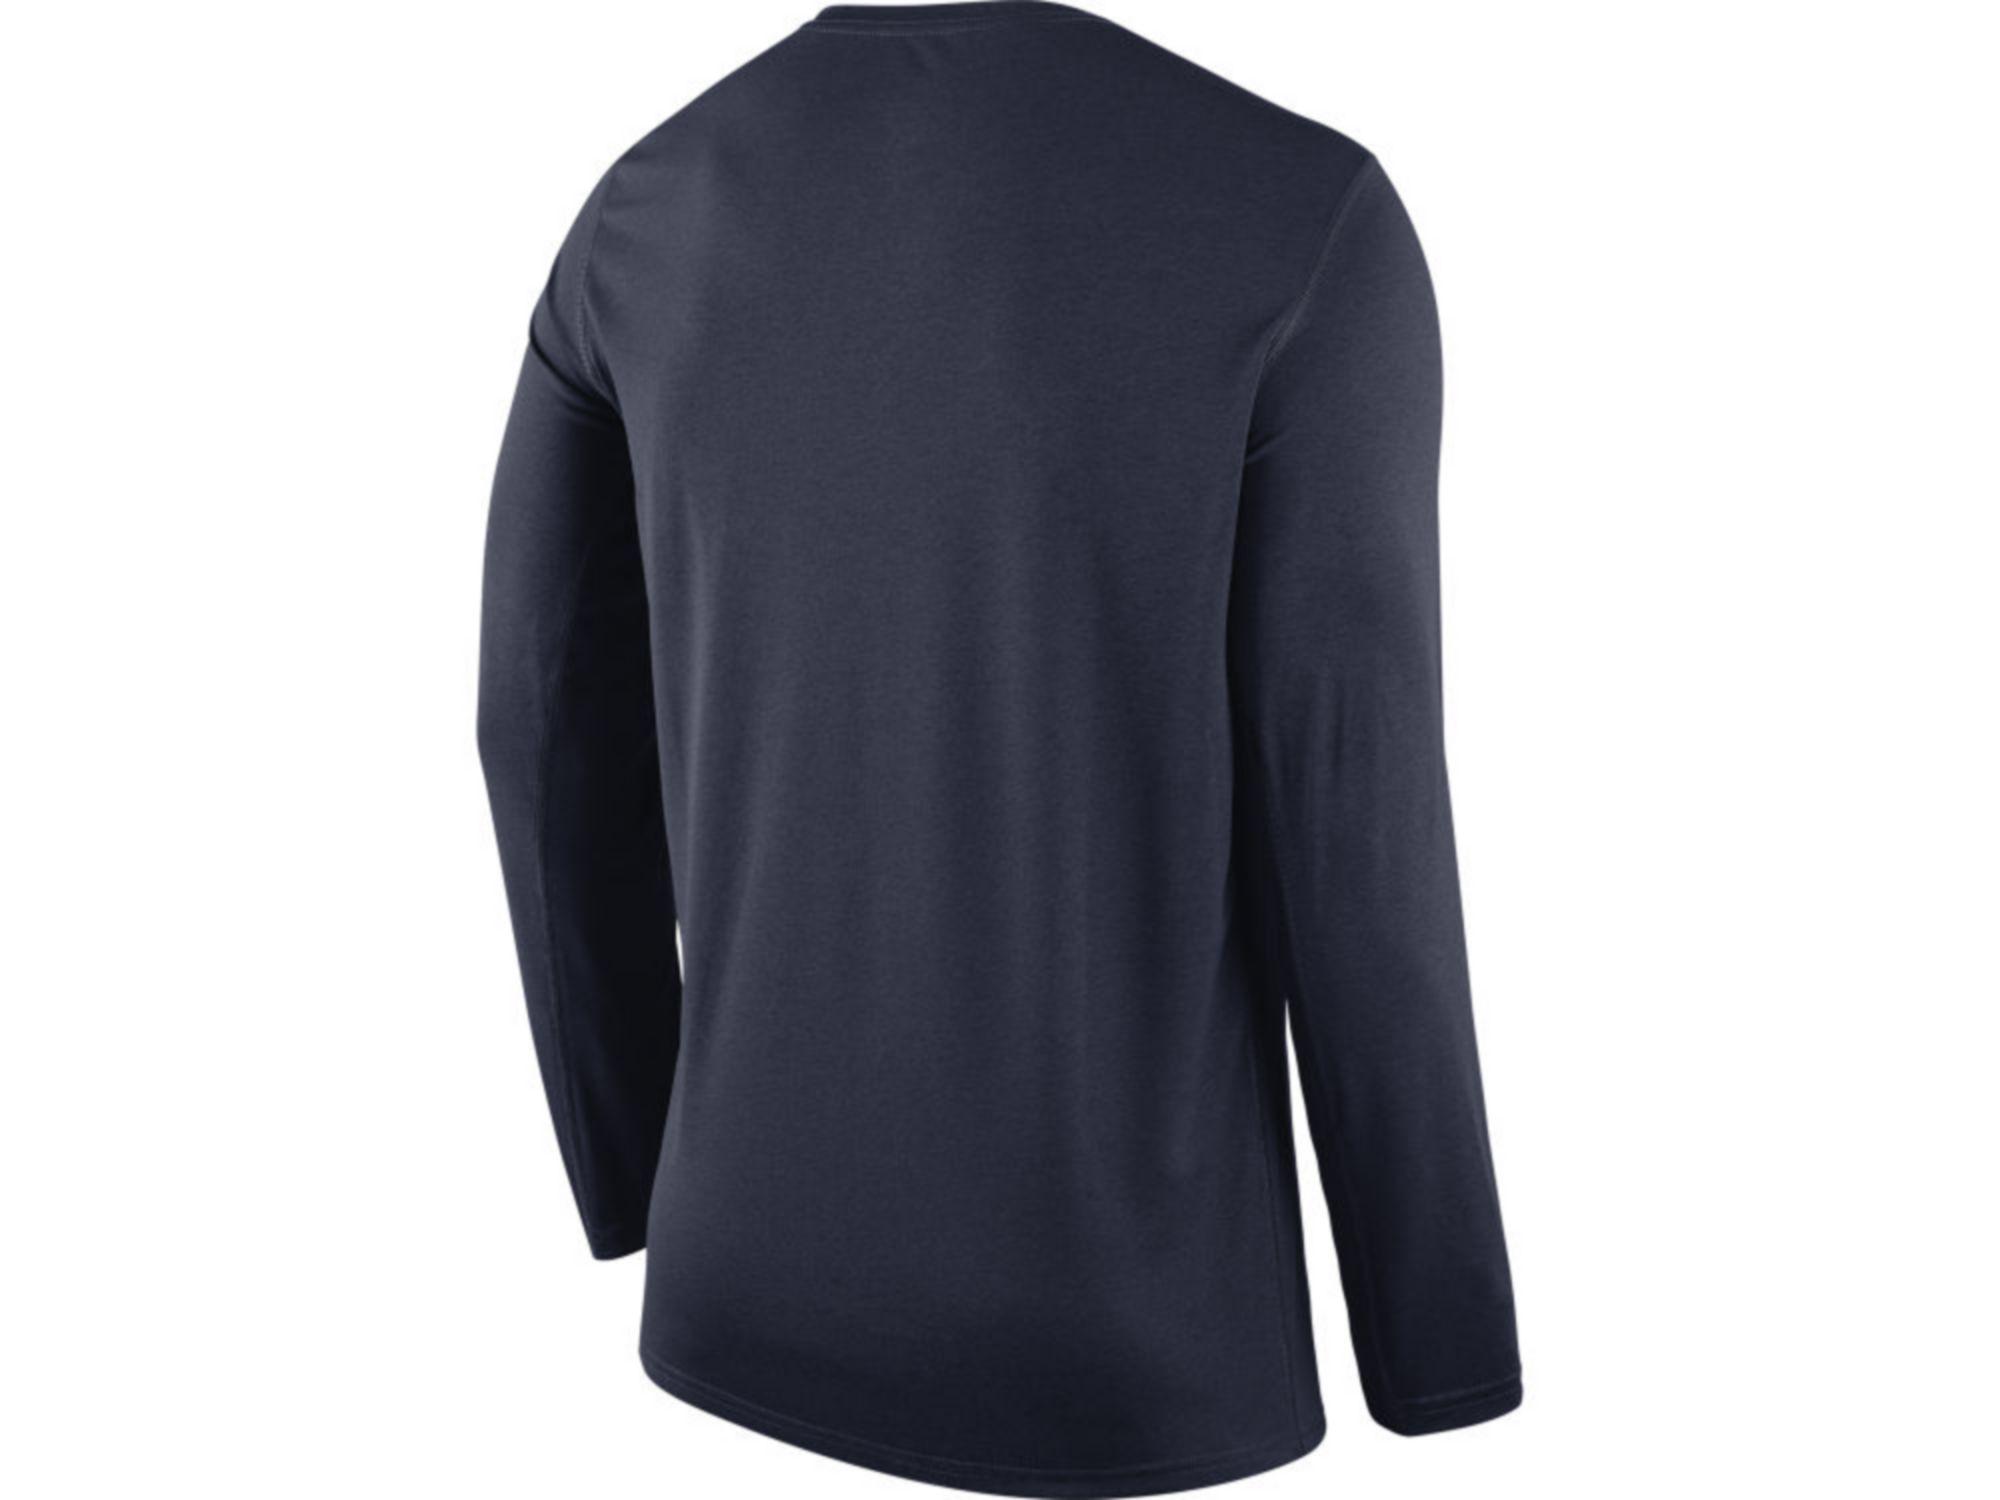 Nike Men's New Orleans Pelicans Practice Long-Sleeve T-Shirt & Reviews - NBA - Sports Fan Shop - Macy's